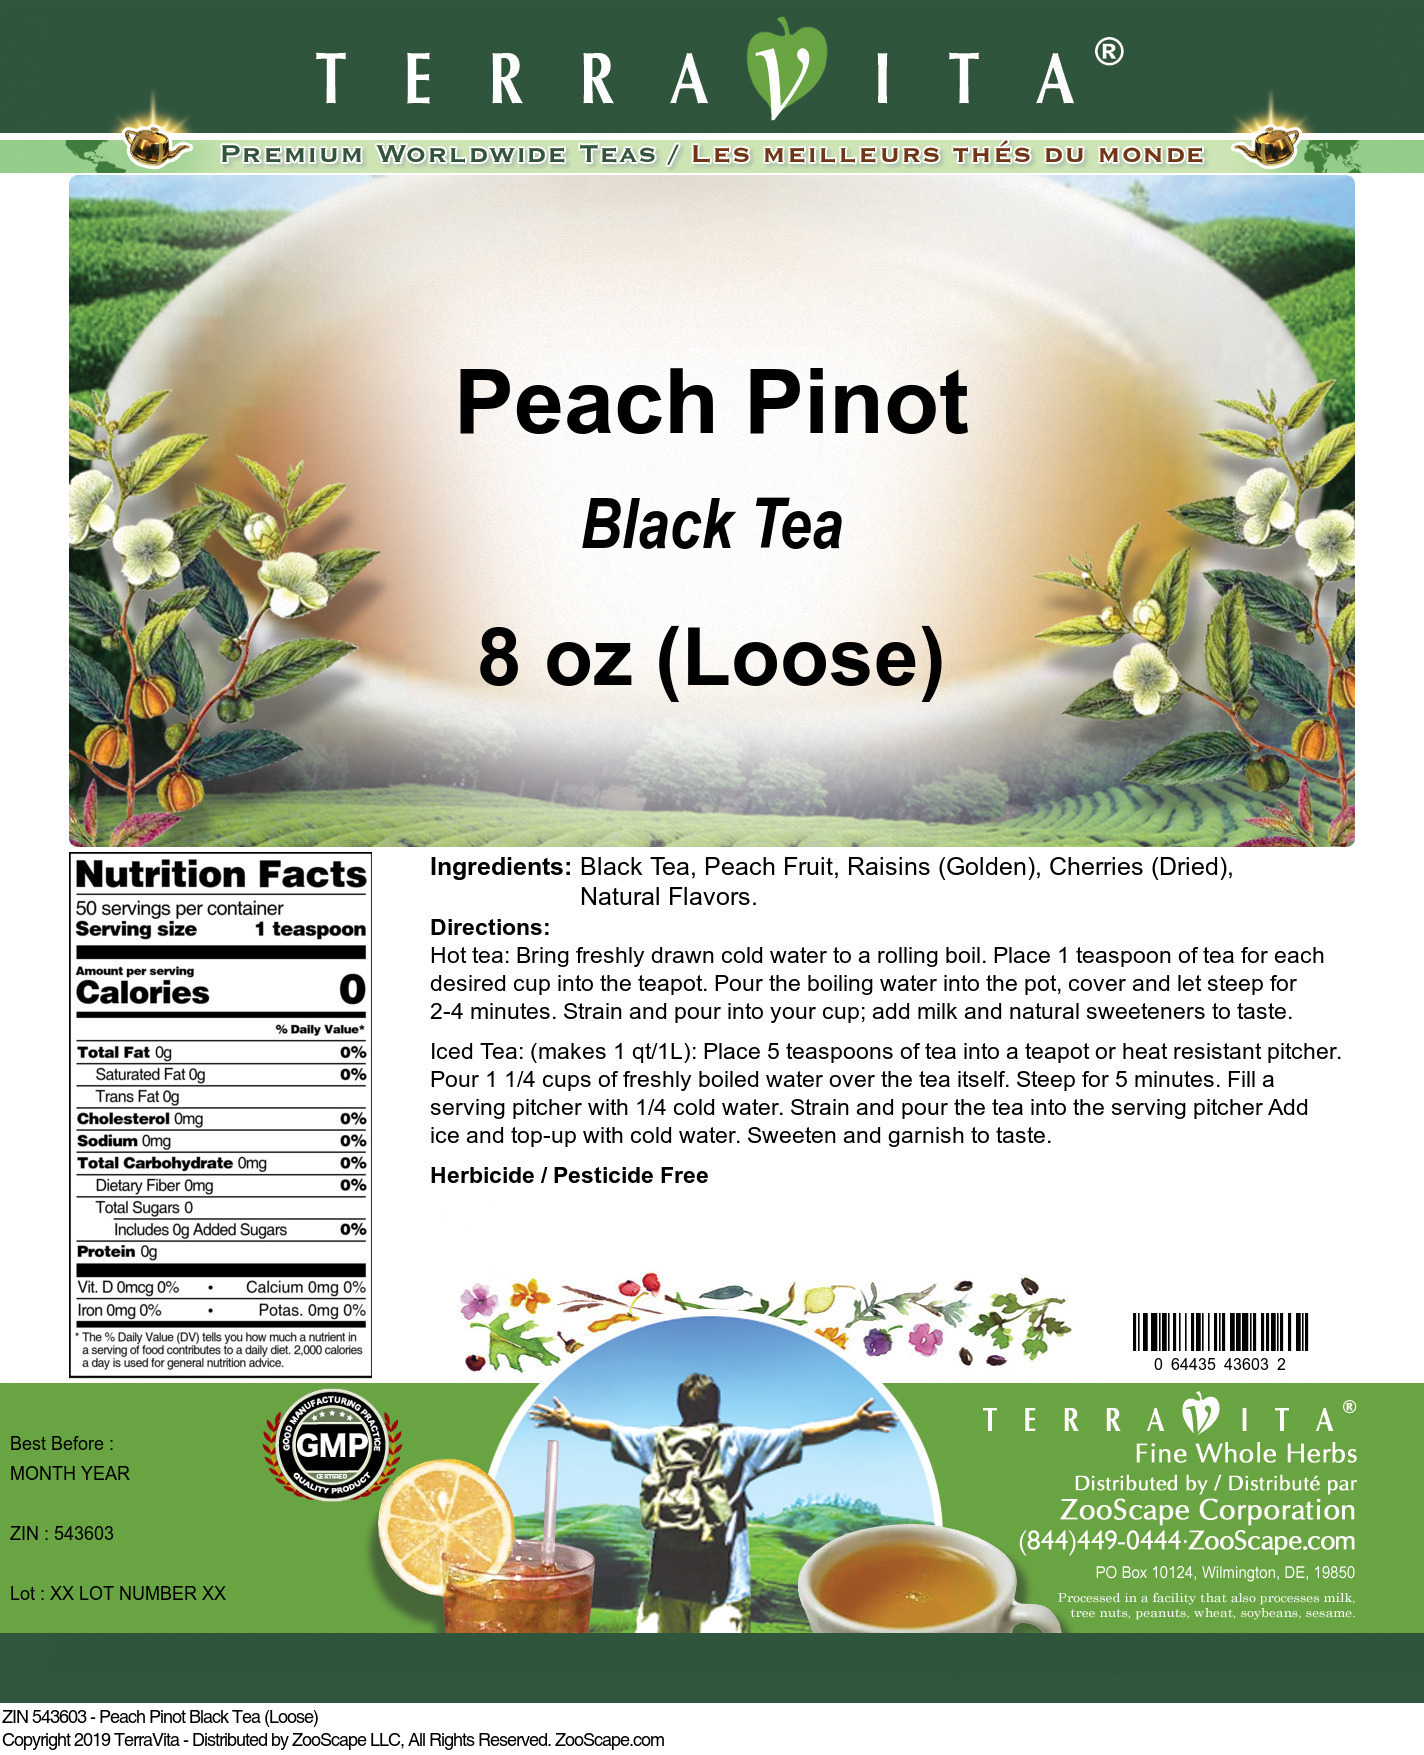 Peach Pinot Black Tea (Loose)